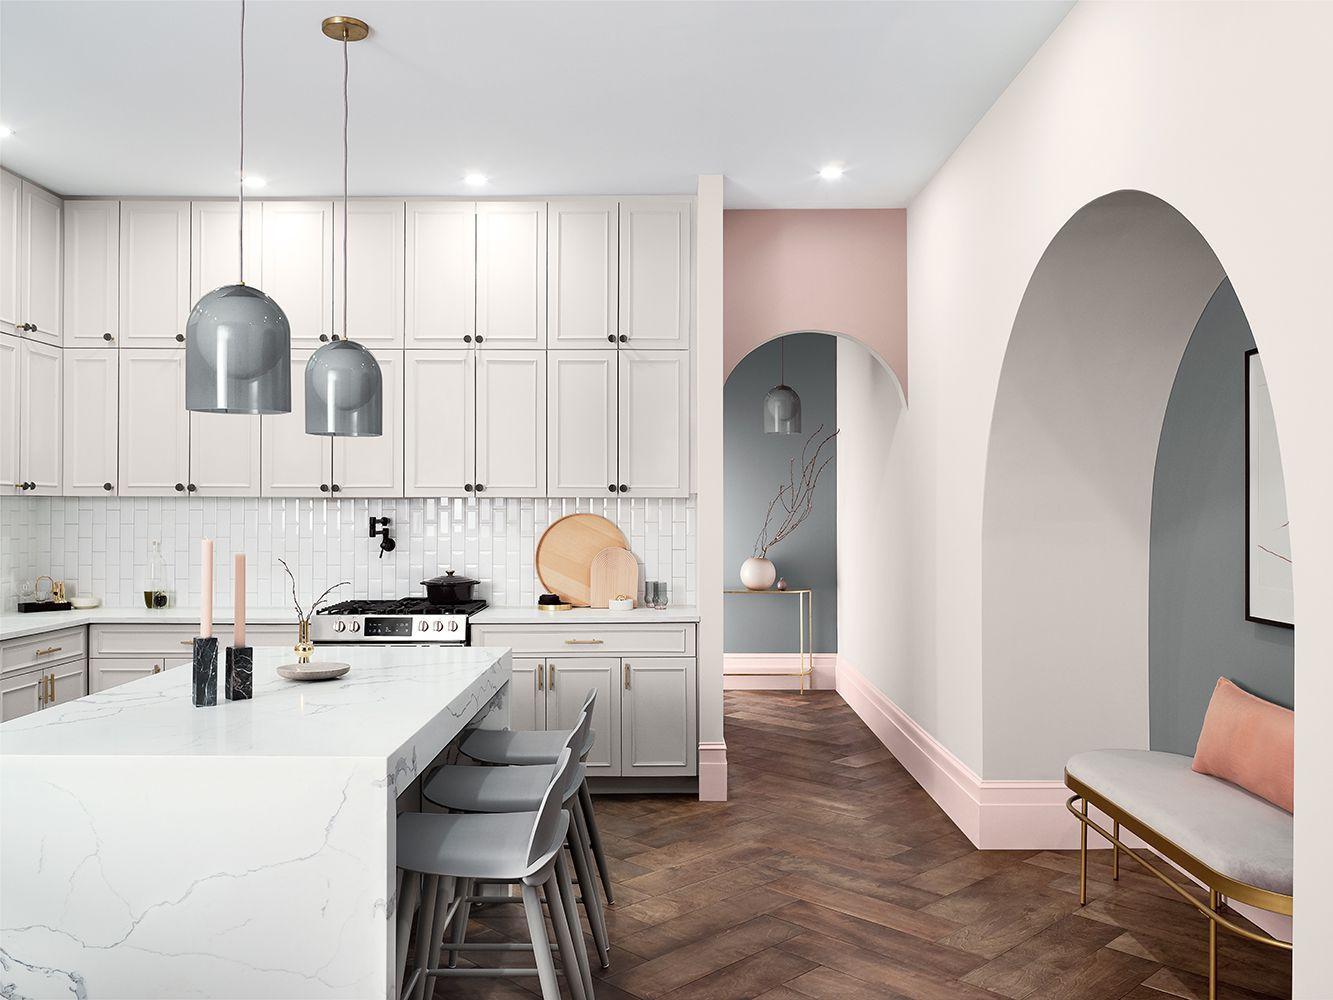 Kitchen with pastel shades